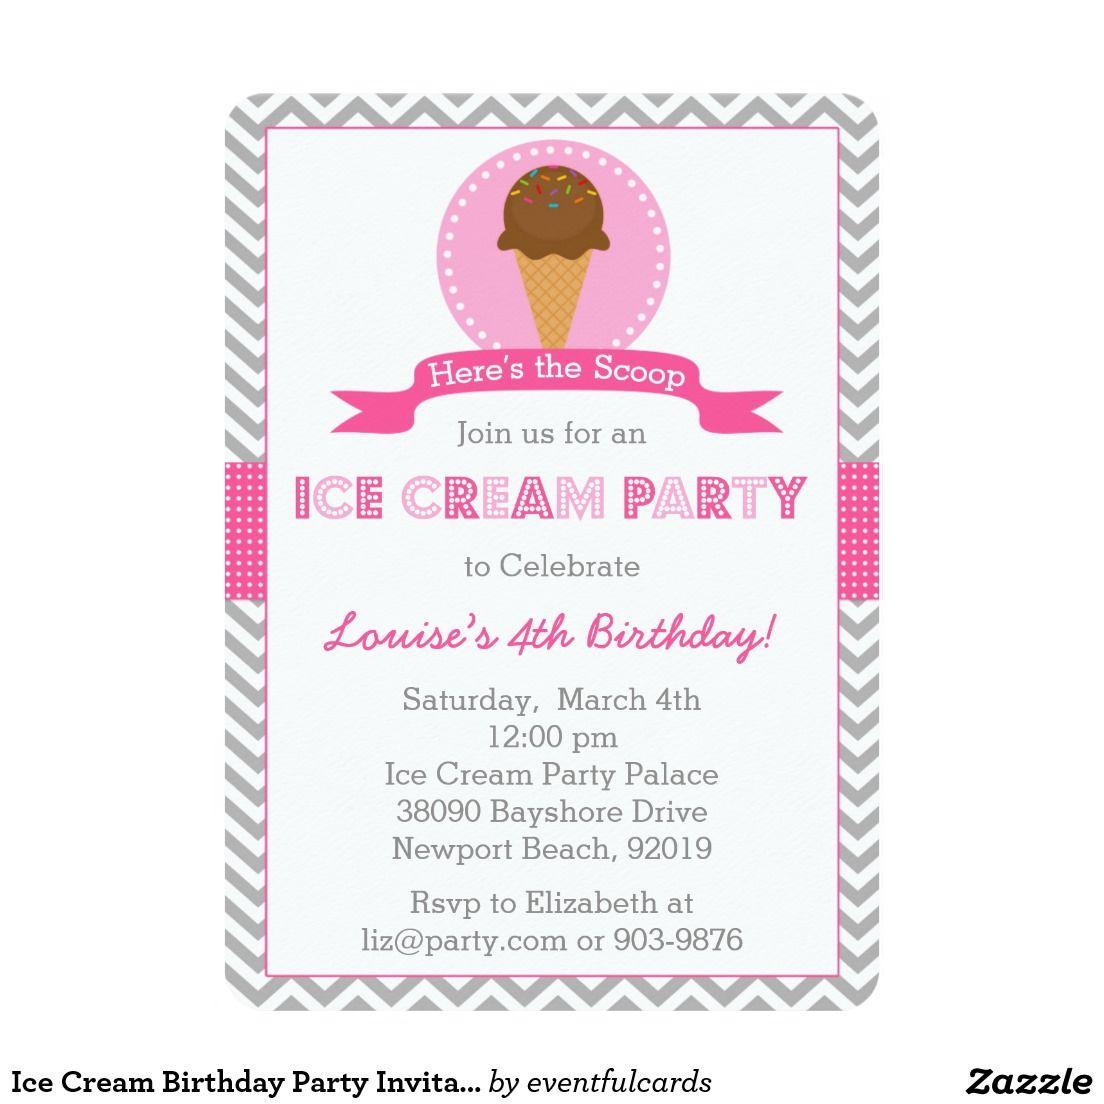 Ice Cream Birthday Party Invitation | National Ice Cream Day ...